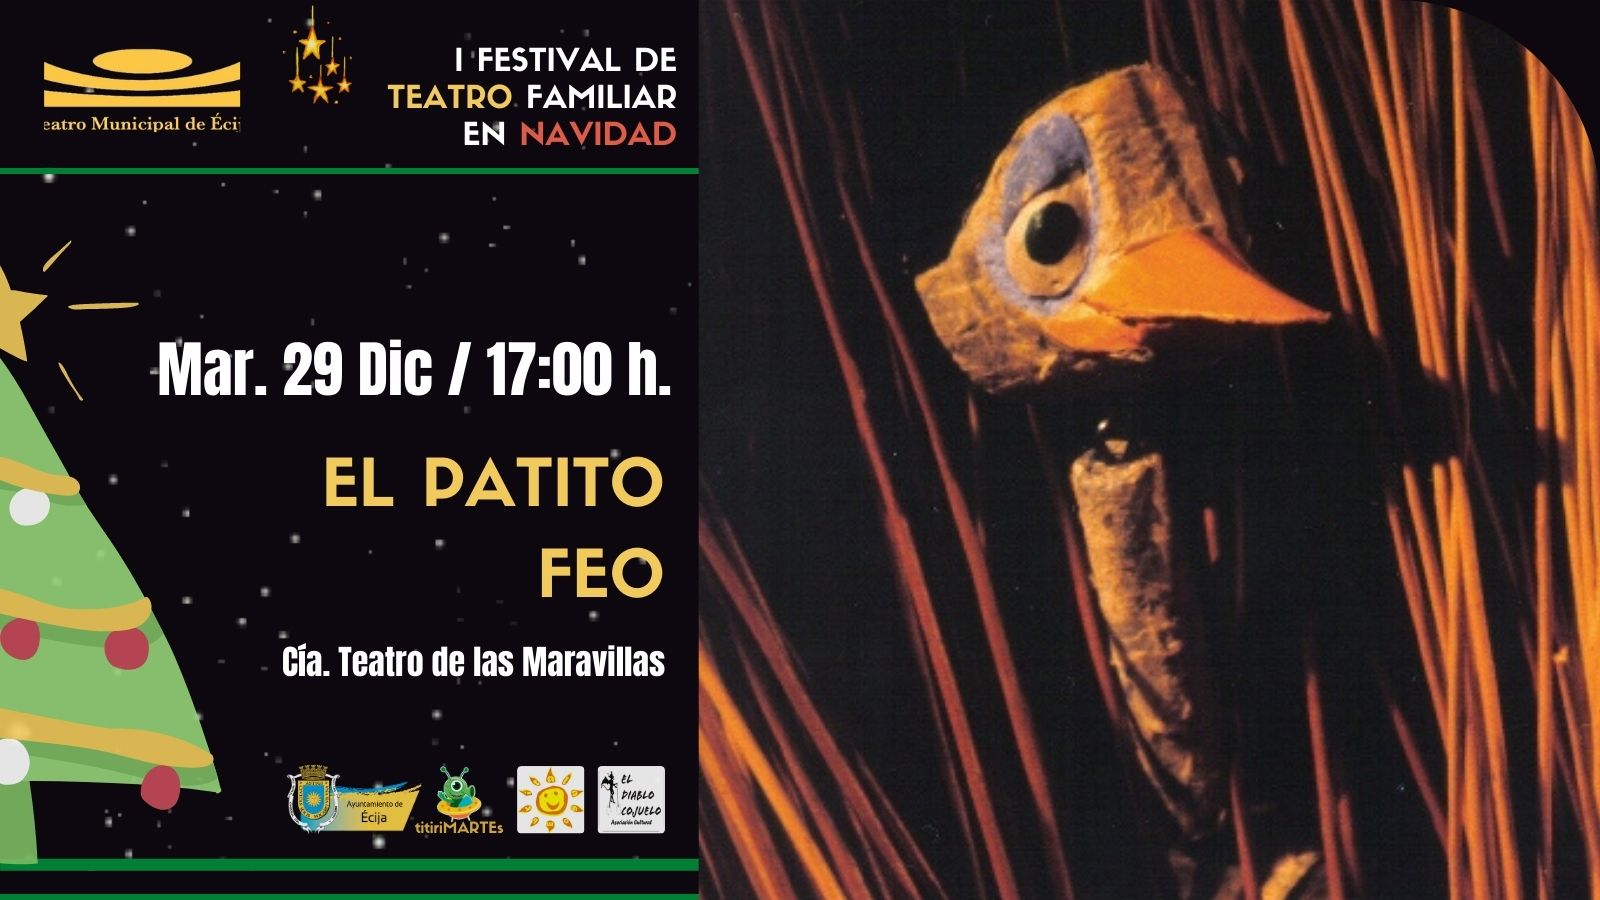 I Festival Teatro Navidad Ecija - El Patito Feo